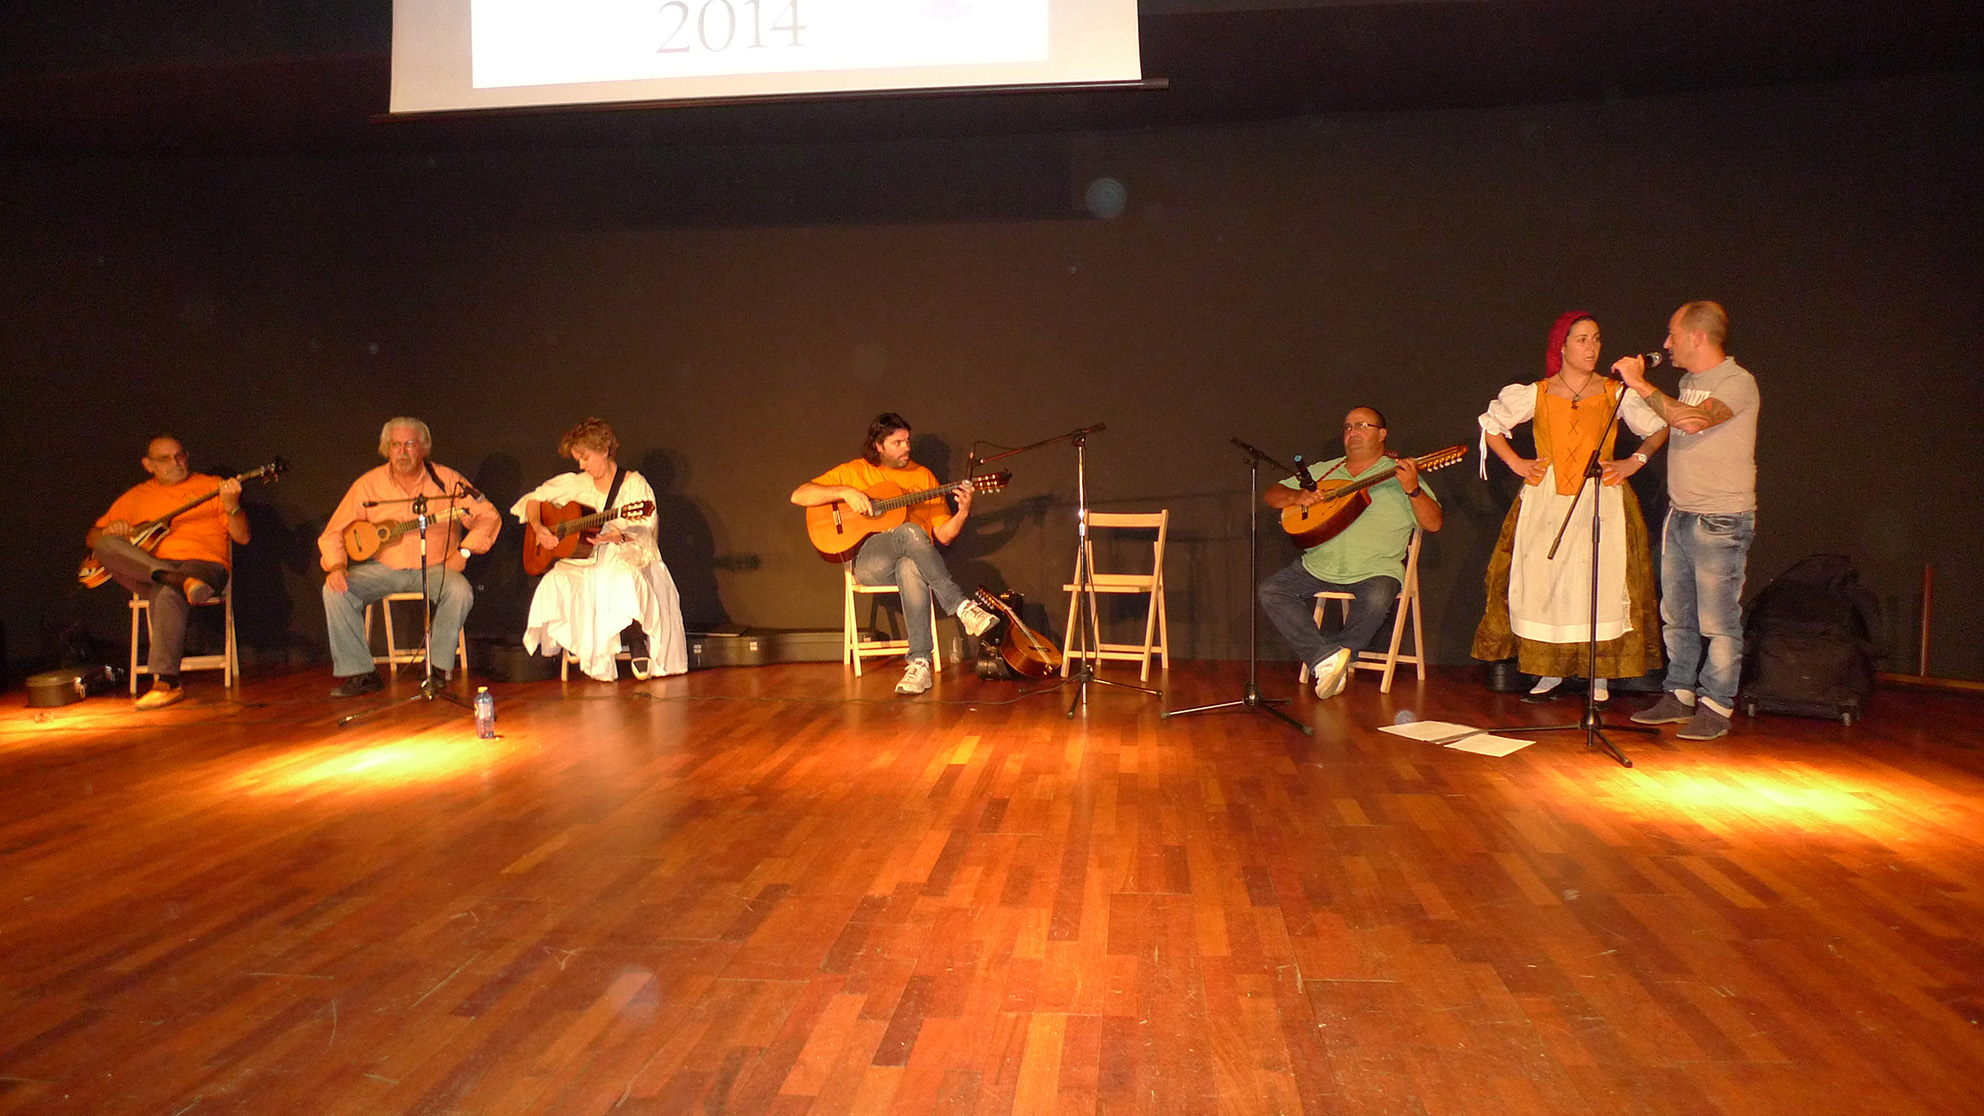 2014-10-25 R.Baladre-Albaida a Asturies Lugones (1)